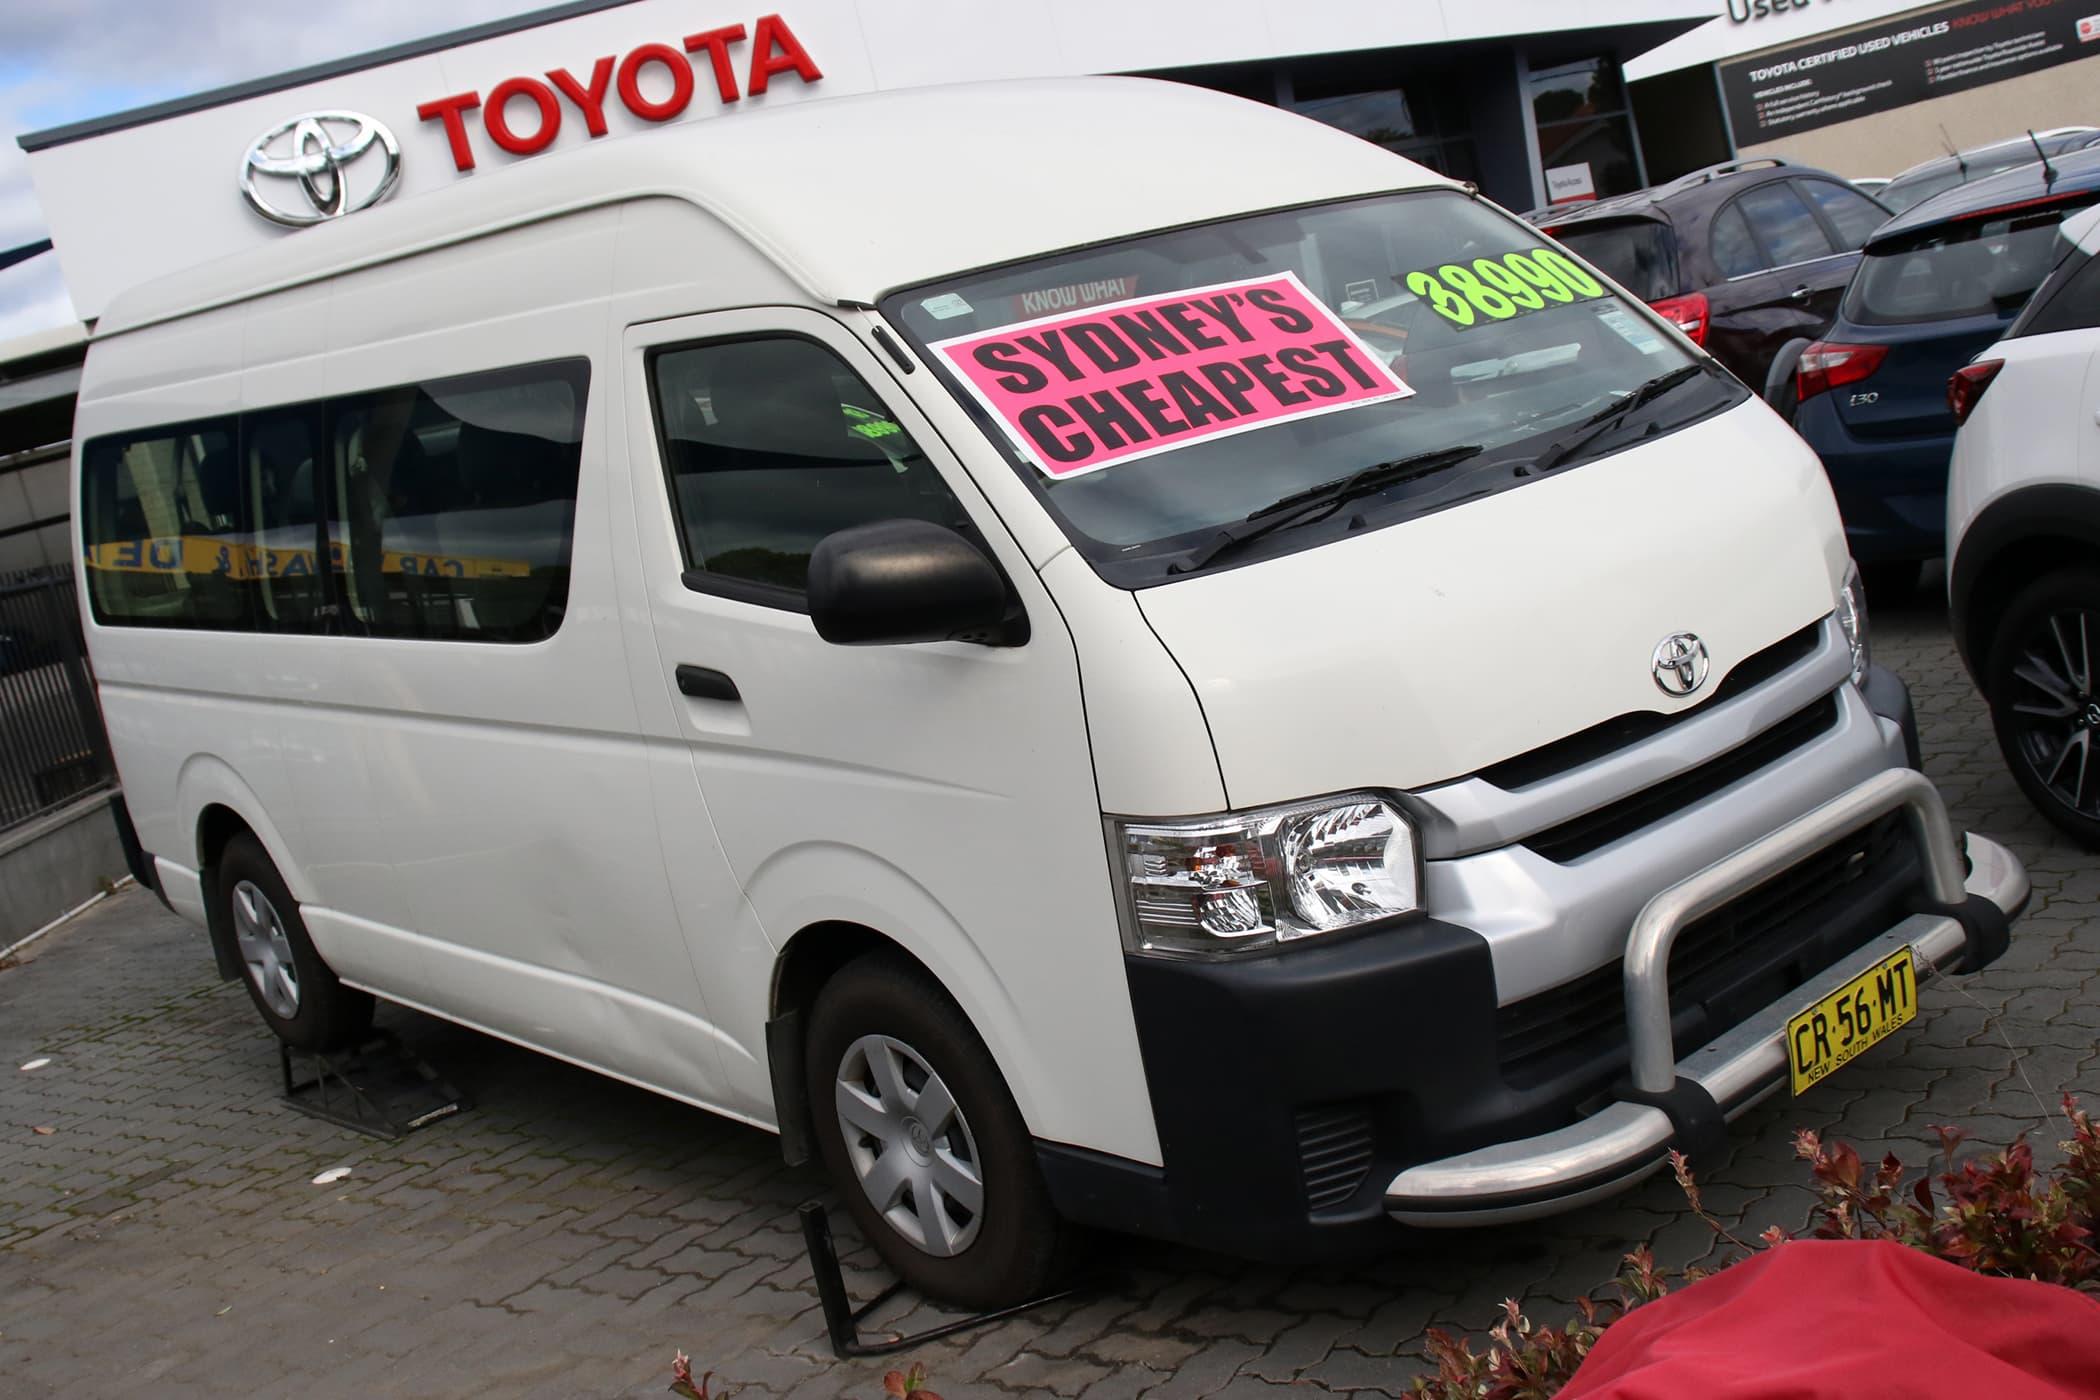 2016 Toyota Hiace Commuter Super LWB Auto - image 1